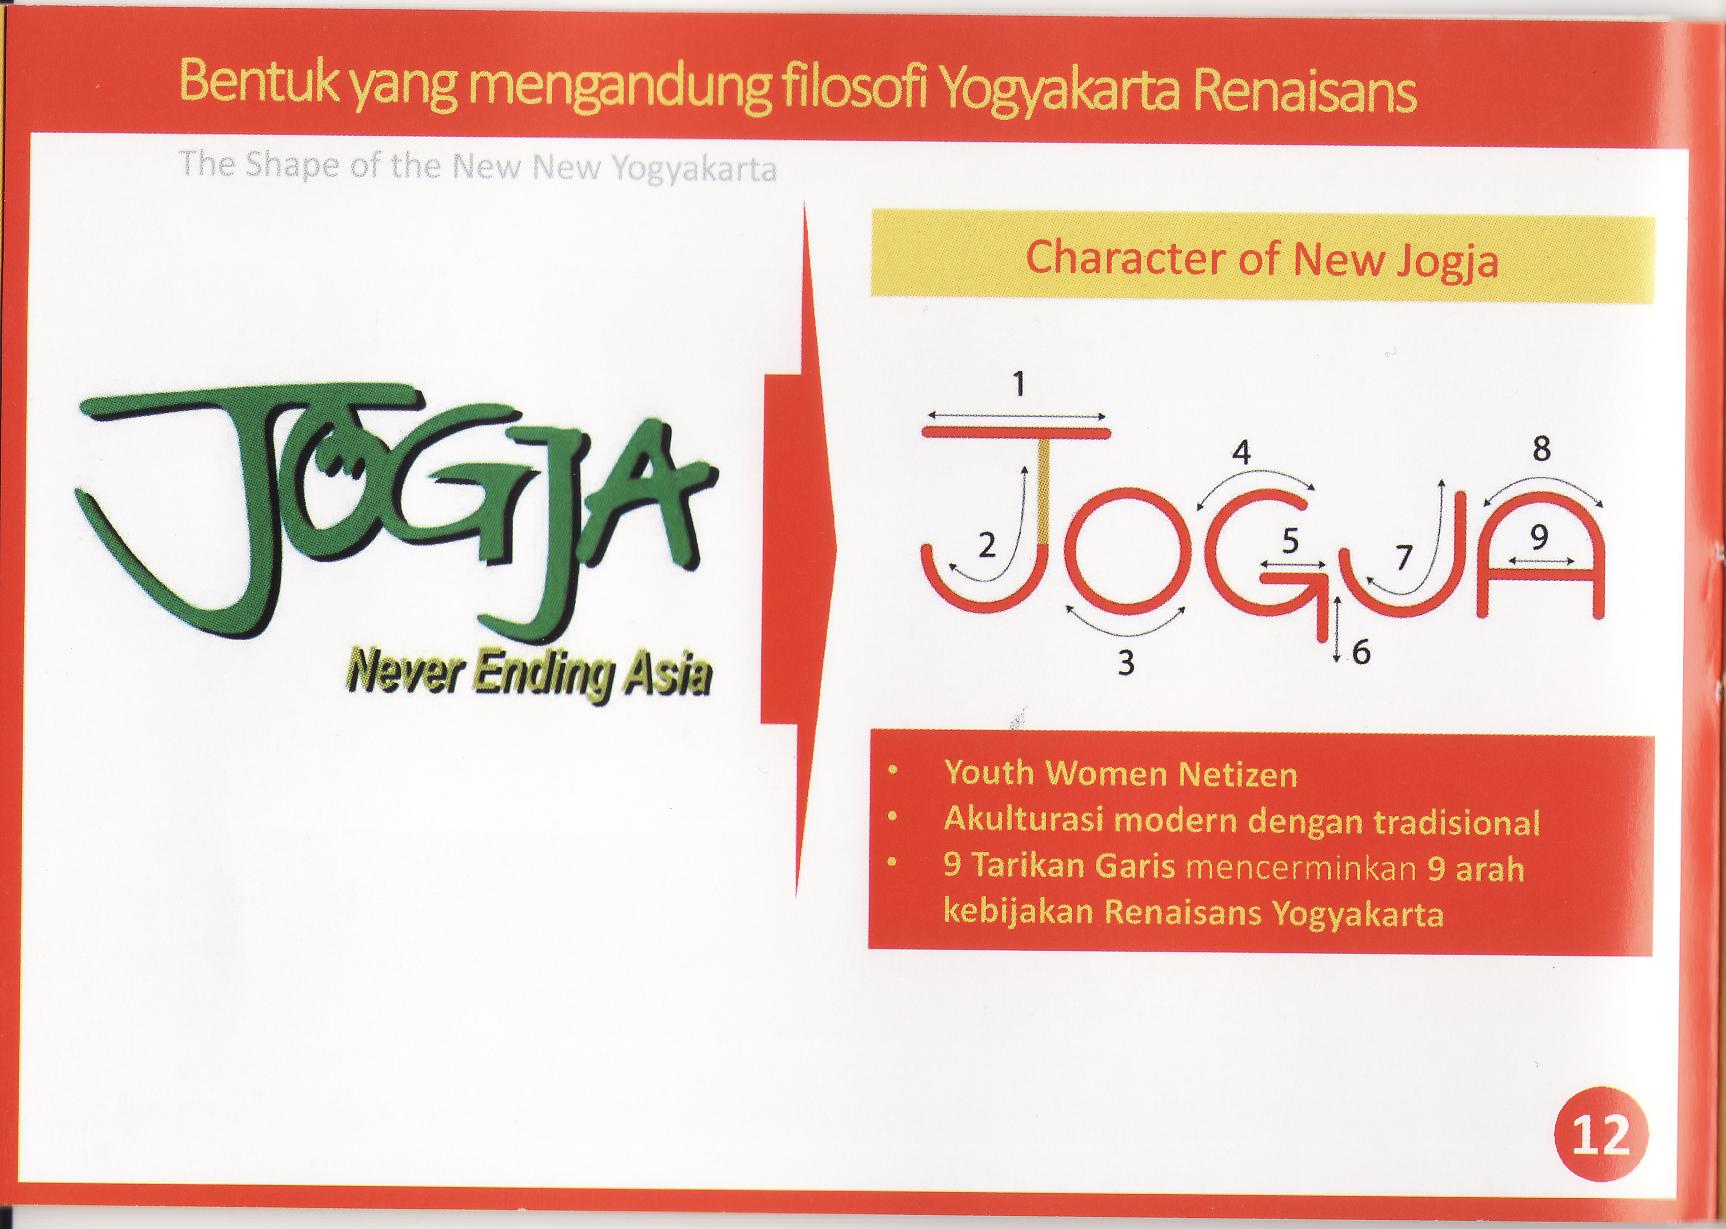 "Rancangan grafis desain logo baru Yogyakarta dengan semboyan ""Jogja Never Ending Asia"". Foto: KRJogja.com"